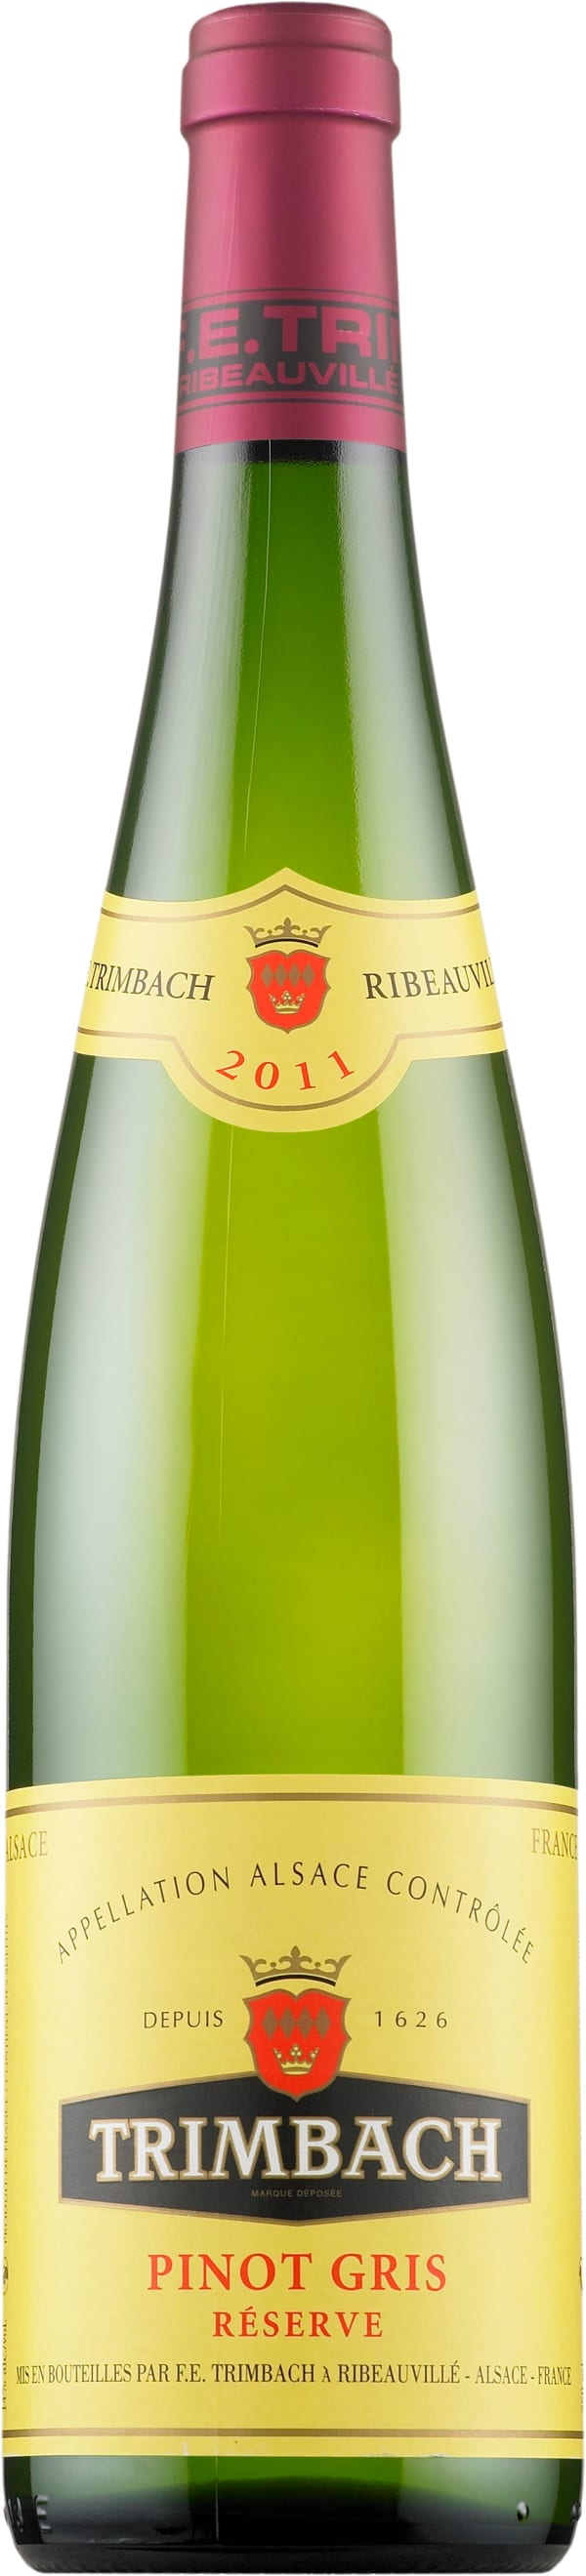 Trimbach Pinot Gris Réserve 2016